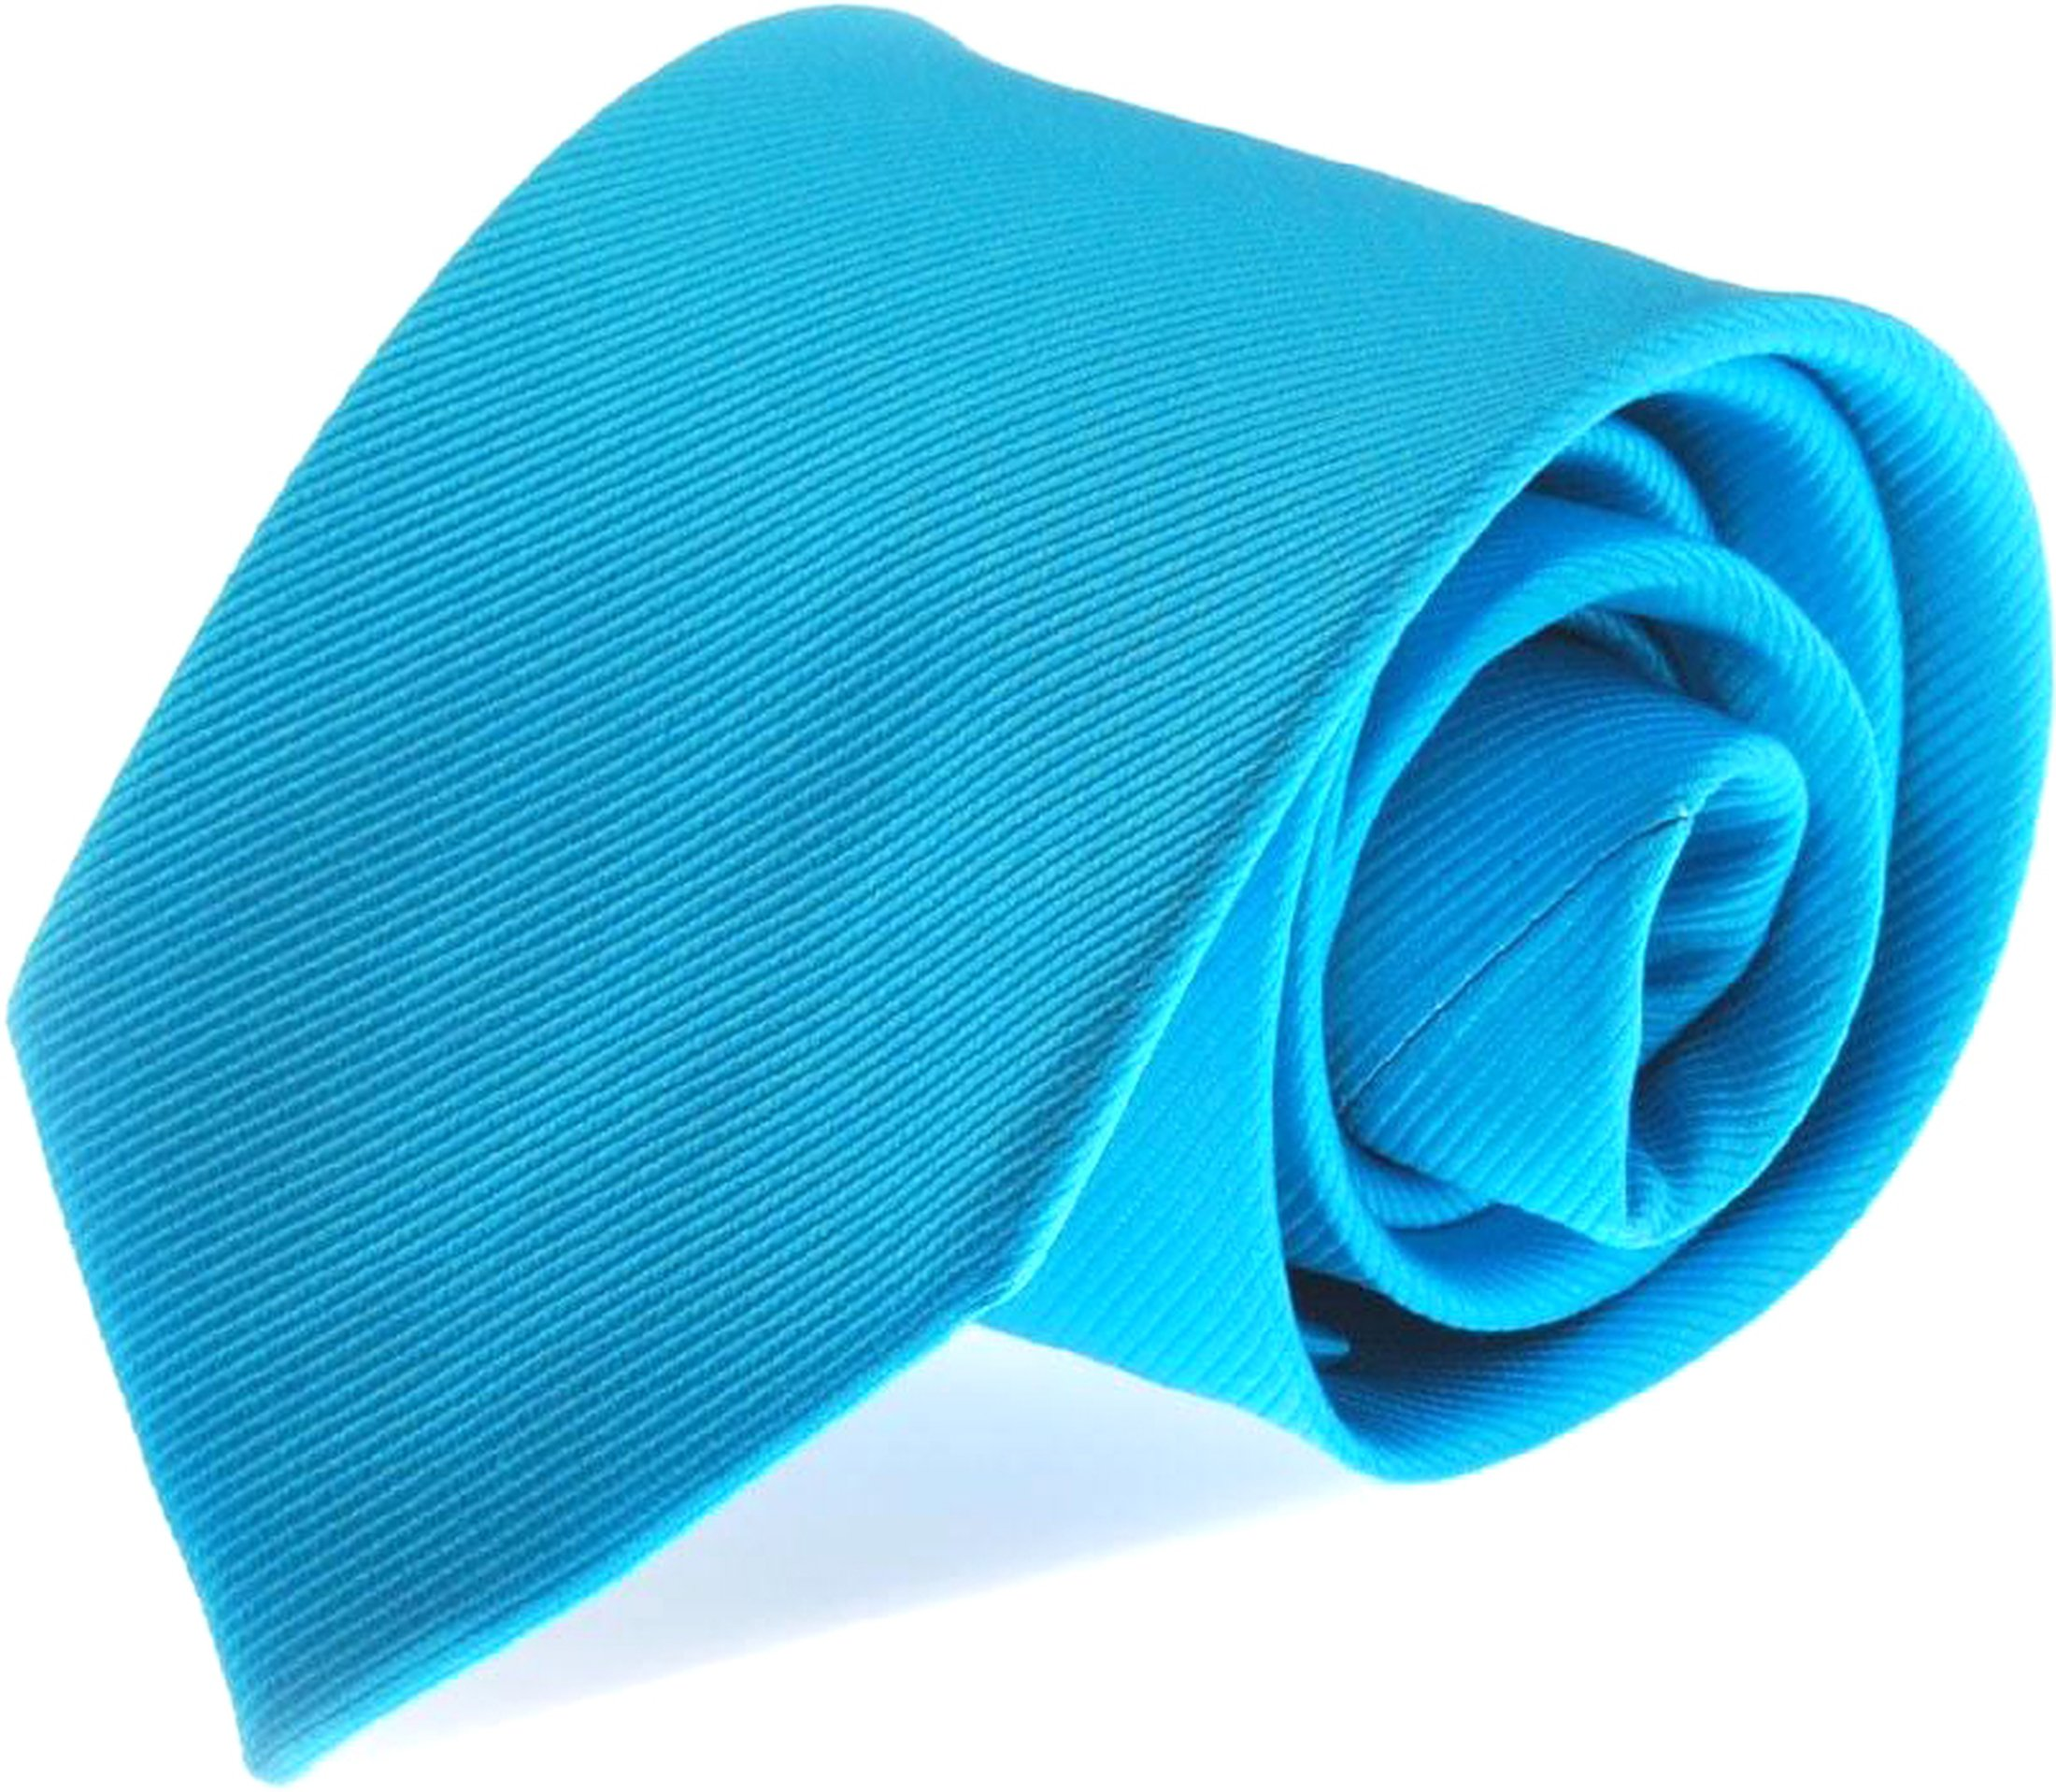 Silk Tie Turquoise F24